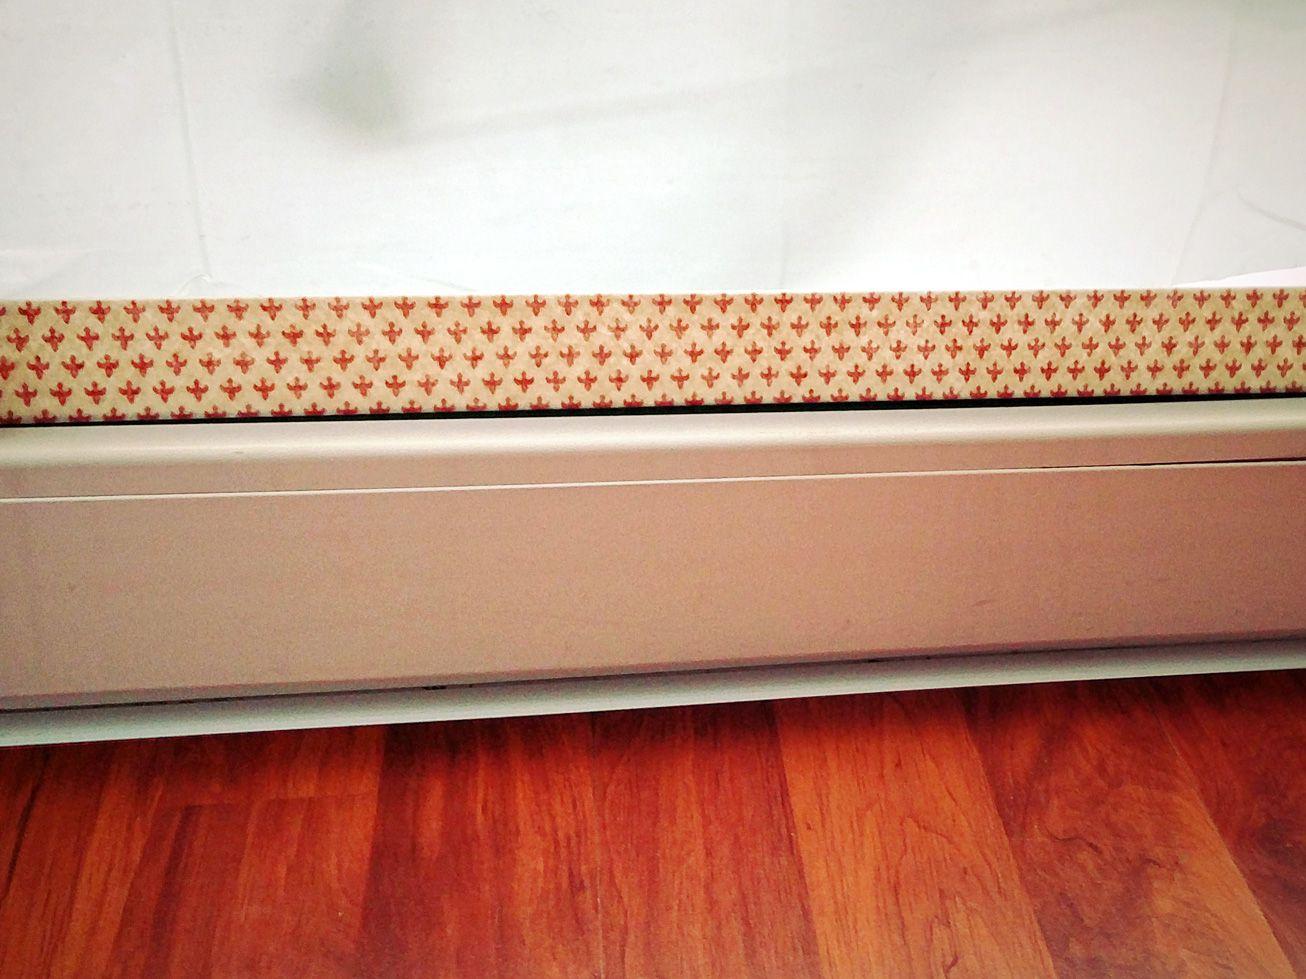 Cseppmentes teraszajt condensation free glass patio door cseppmentes teraszajt condensation free glass patio door window condensation solution planetlyrics Images